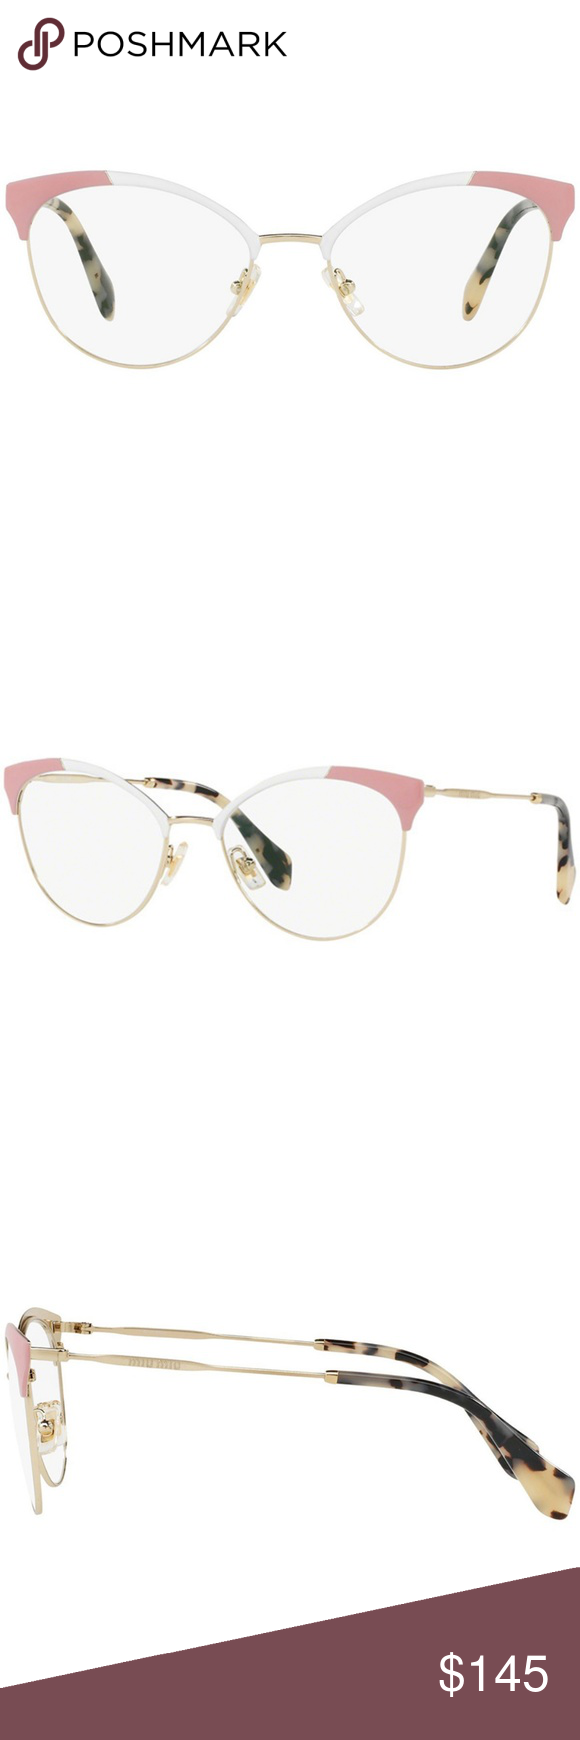 2863942ac6b3 Miu Miu Sunglasses Pale Gold White Pink Miu Miu Cat Eye Style Eyeglasses  Women Having Pale Gold White Pink Color Metal Frame with Demo Lens.